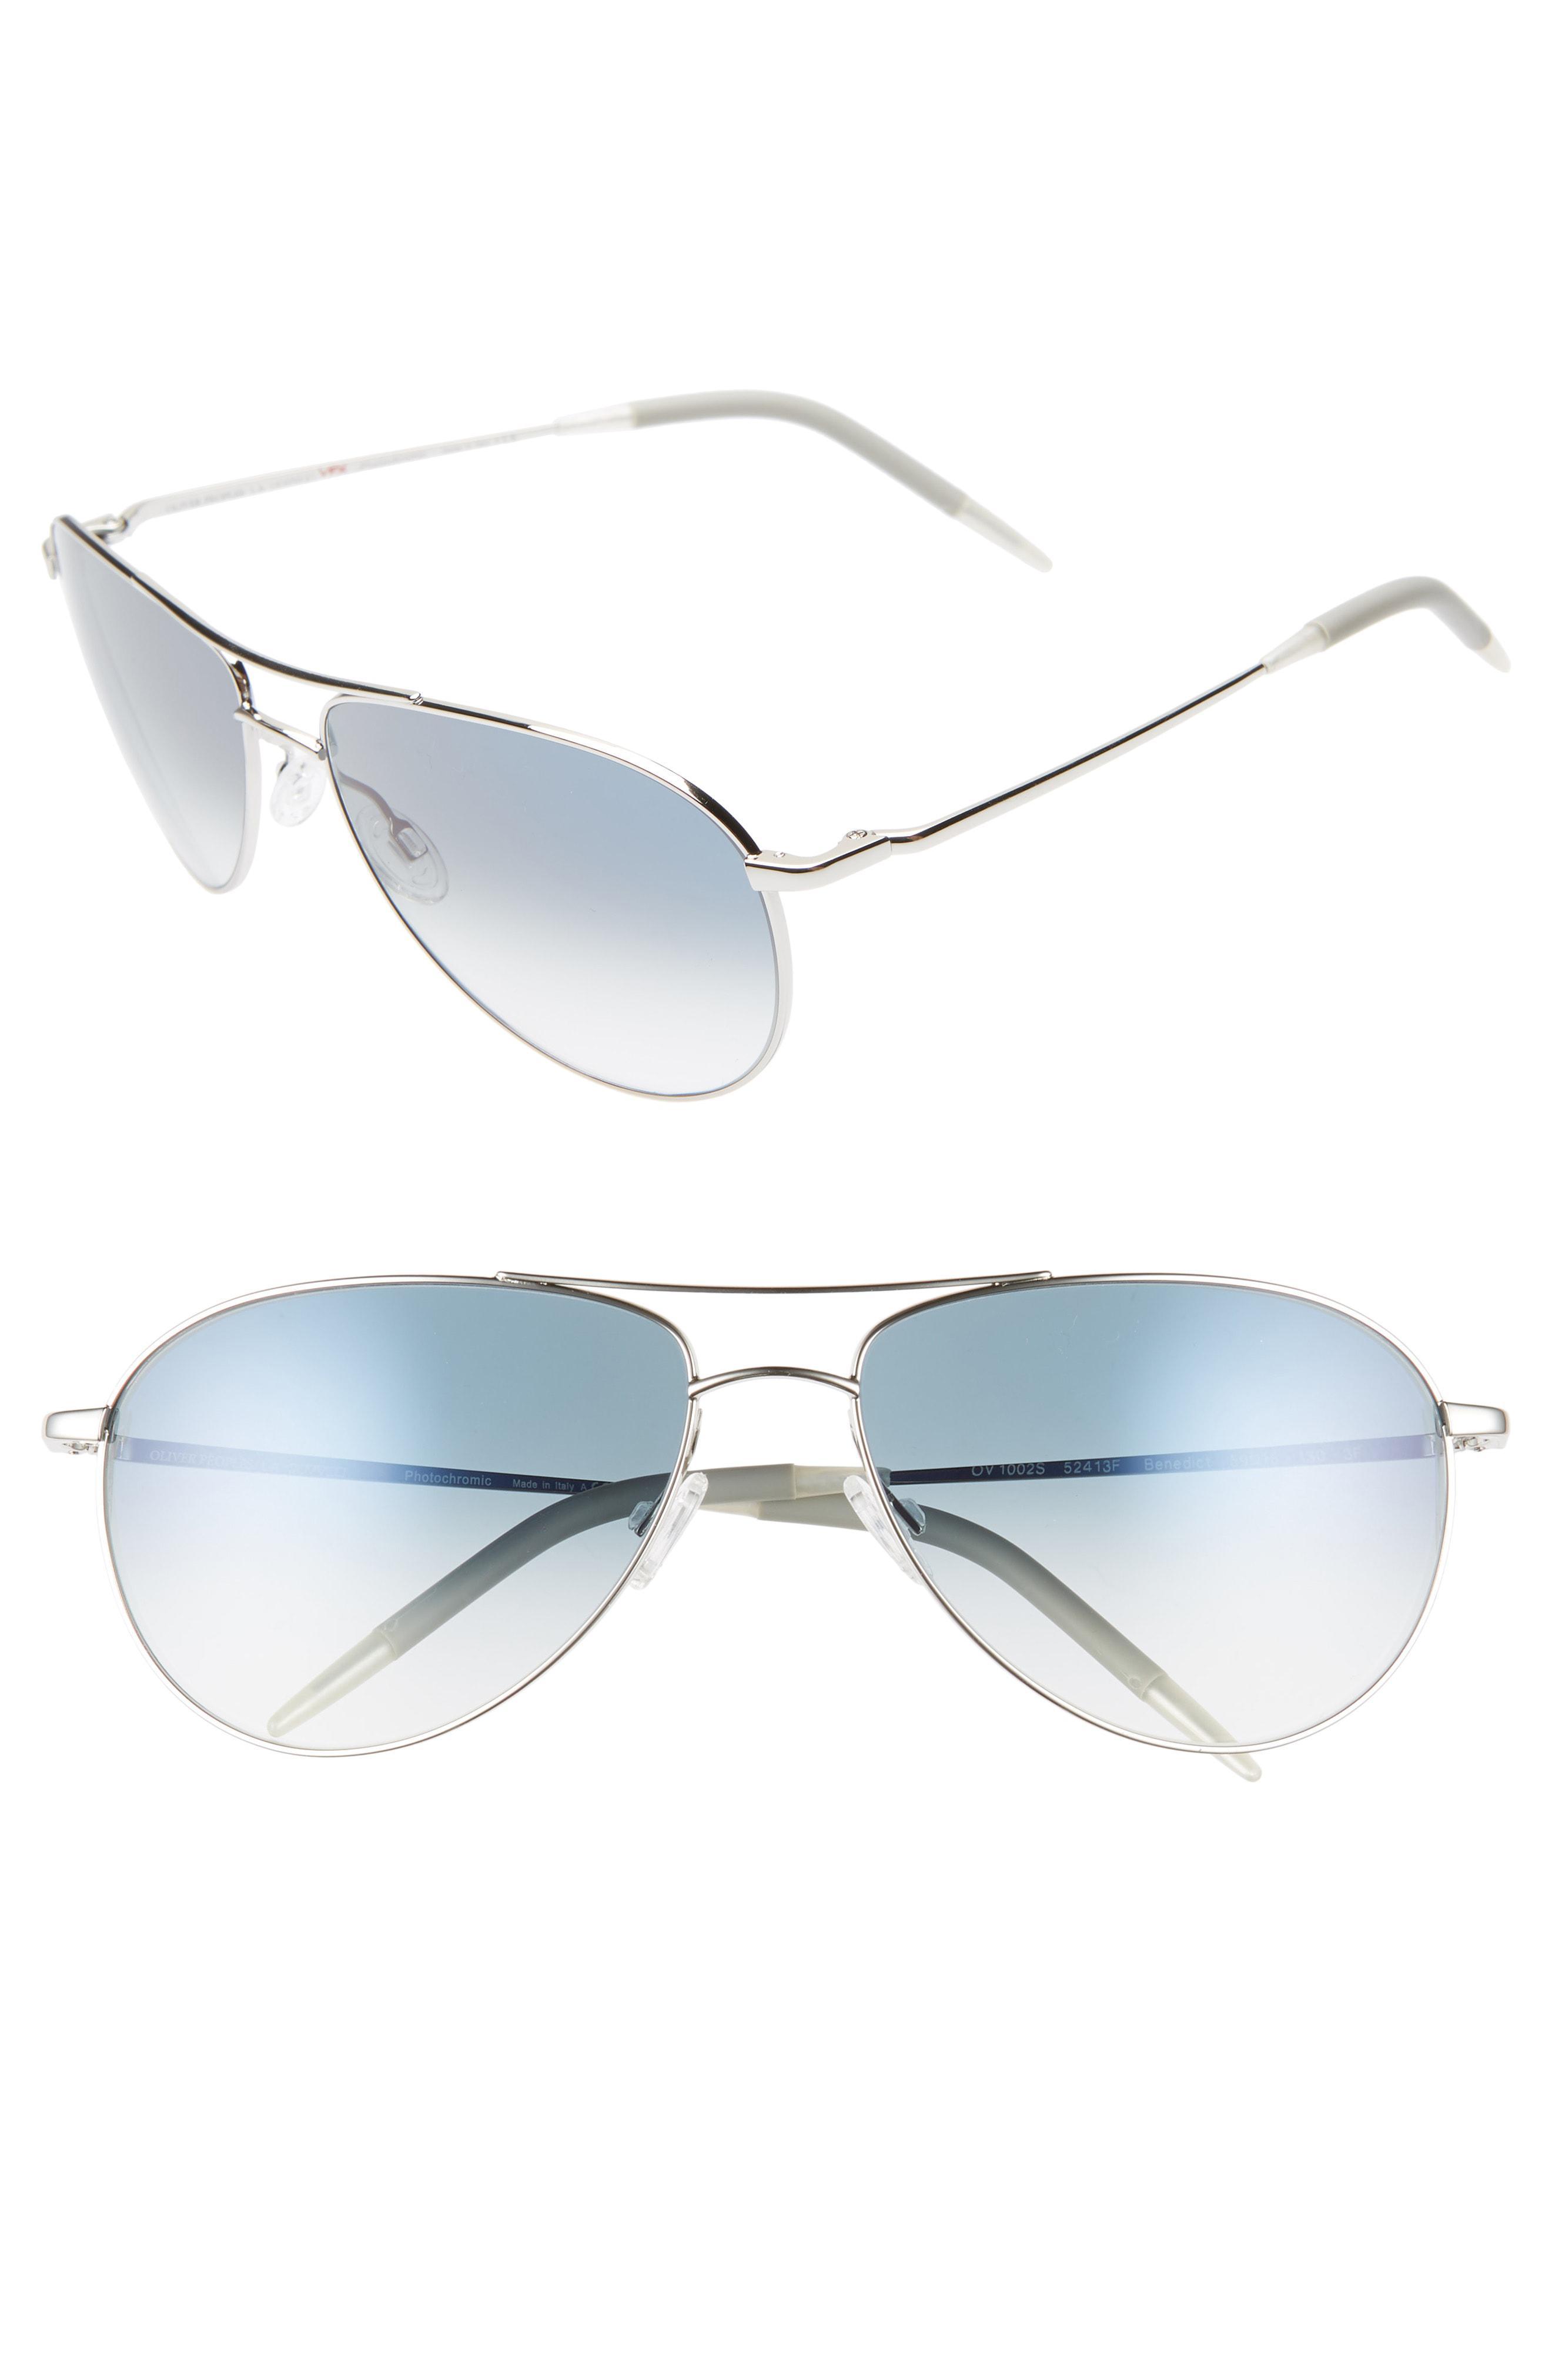 9dd9b309206 Oliver Peoples. Men s Metallic Benedict 59mm Gradient Aviator Sunglasses